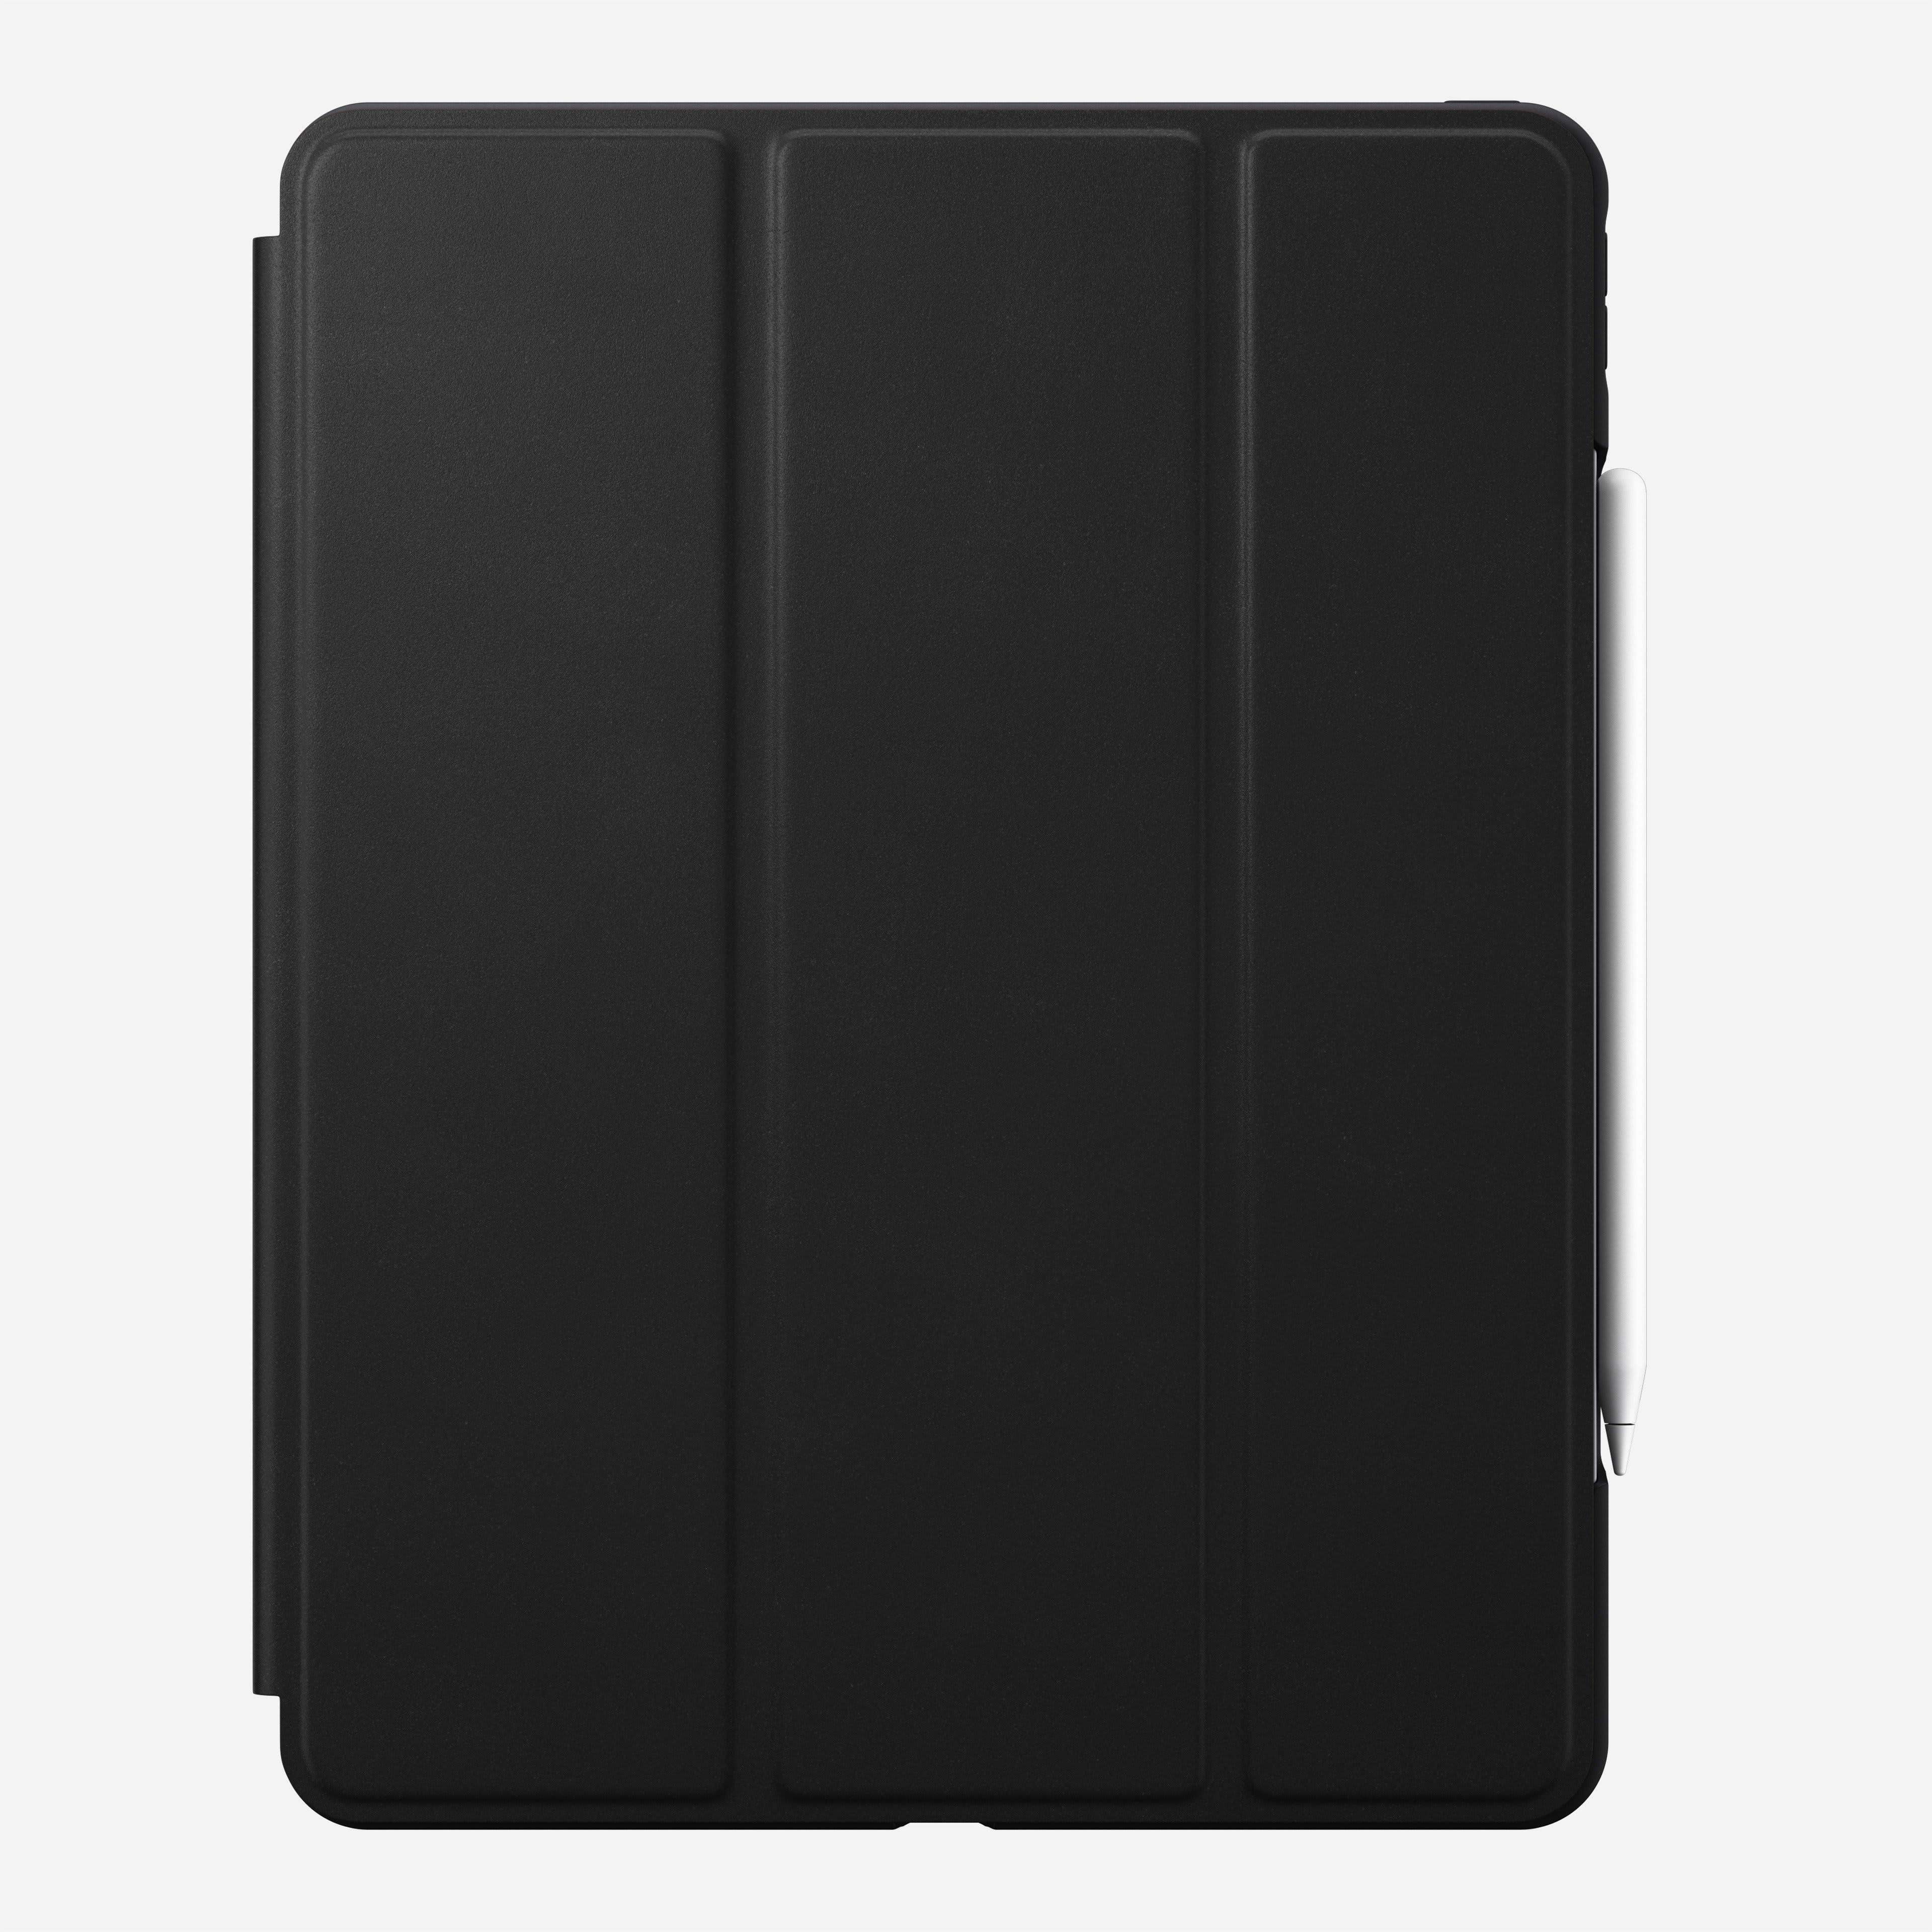 Rugged folio horween leather black ipad pro 12 9 inch 4th generation